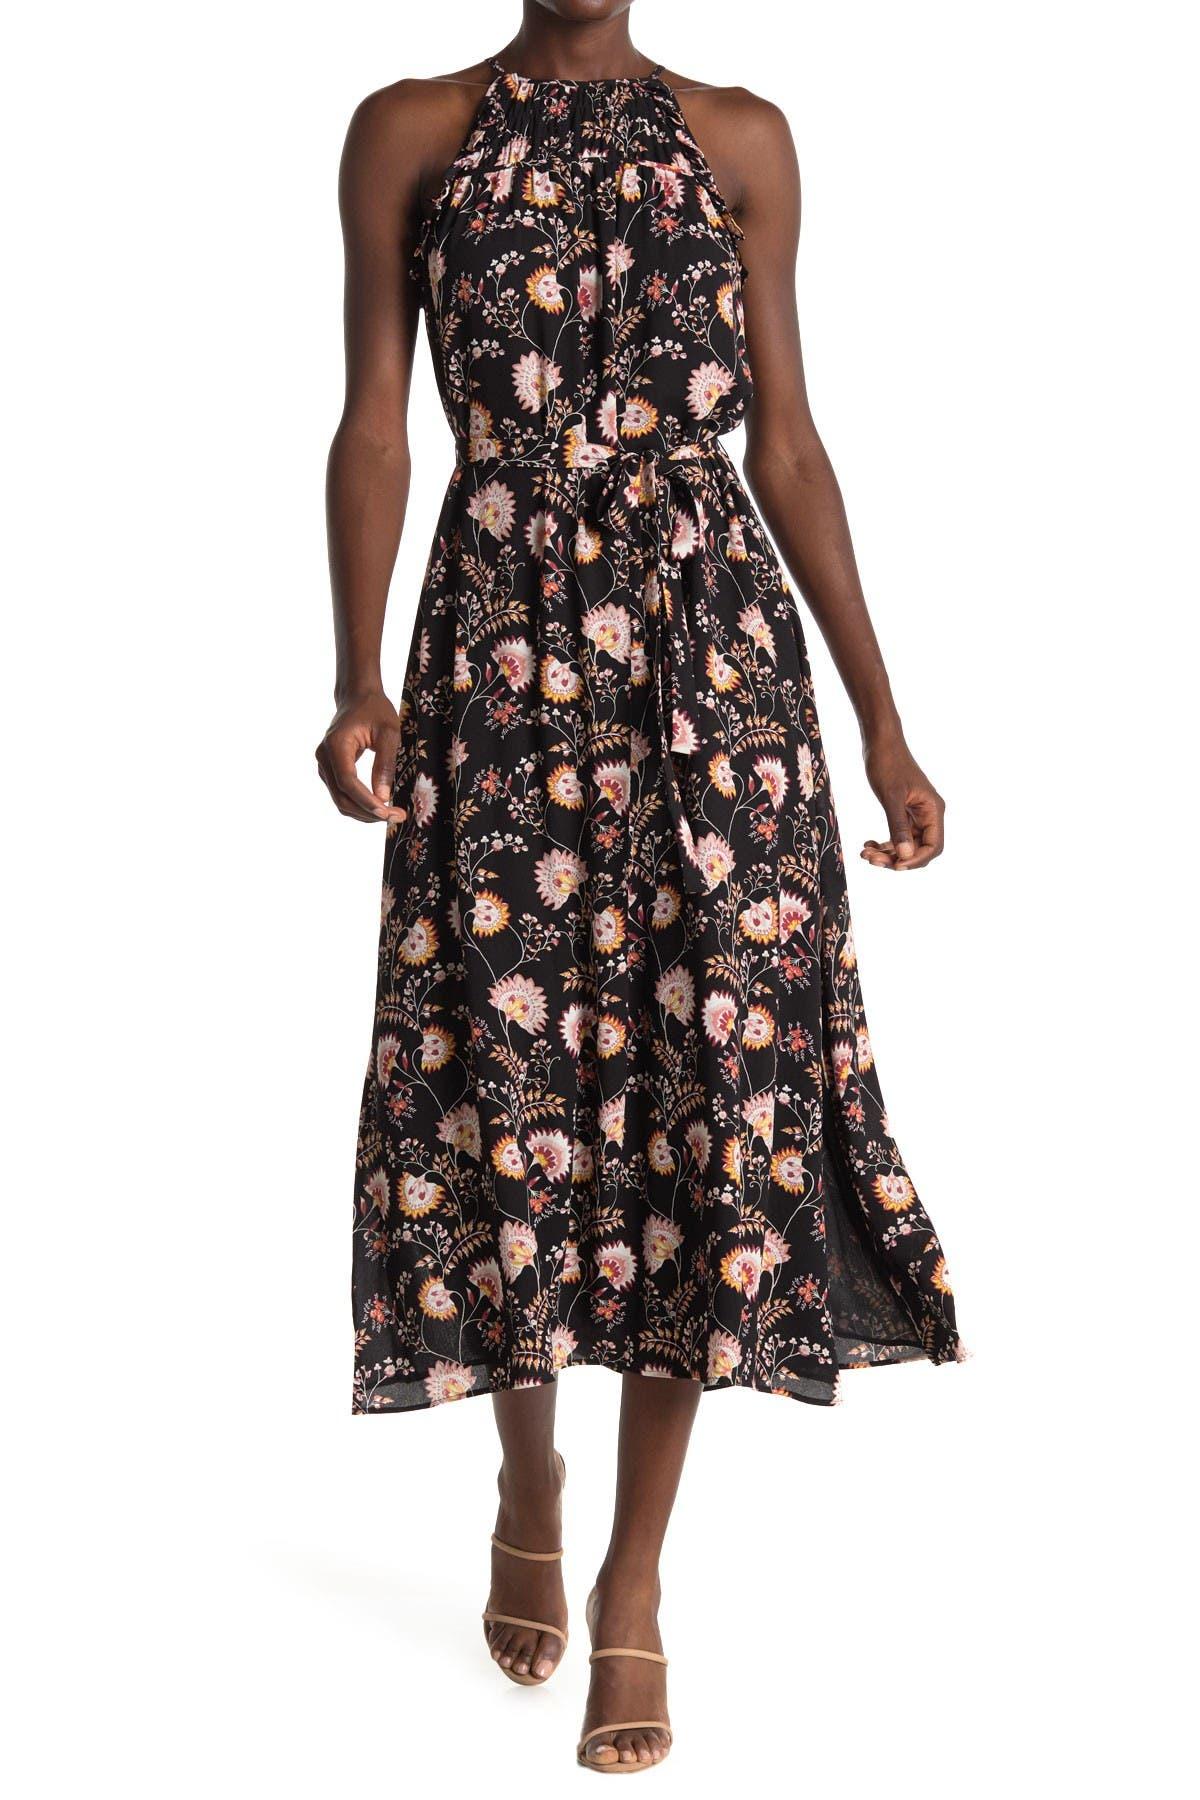 Image of 1.State Floral Halter Neck Tie Waist Midi Dress